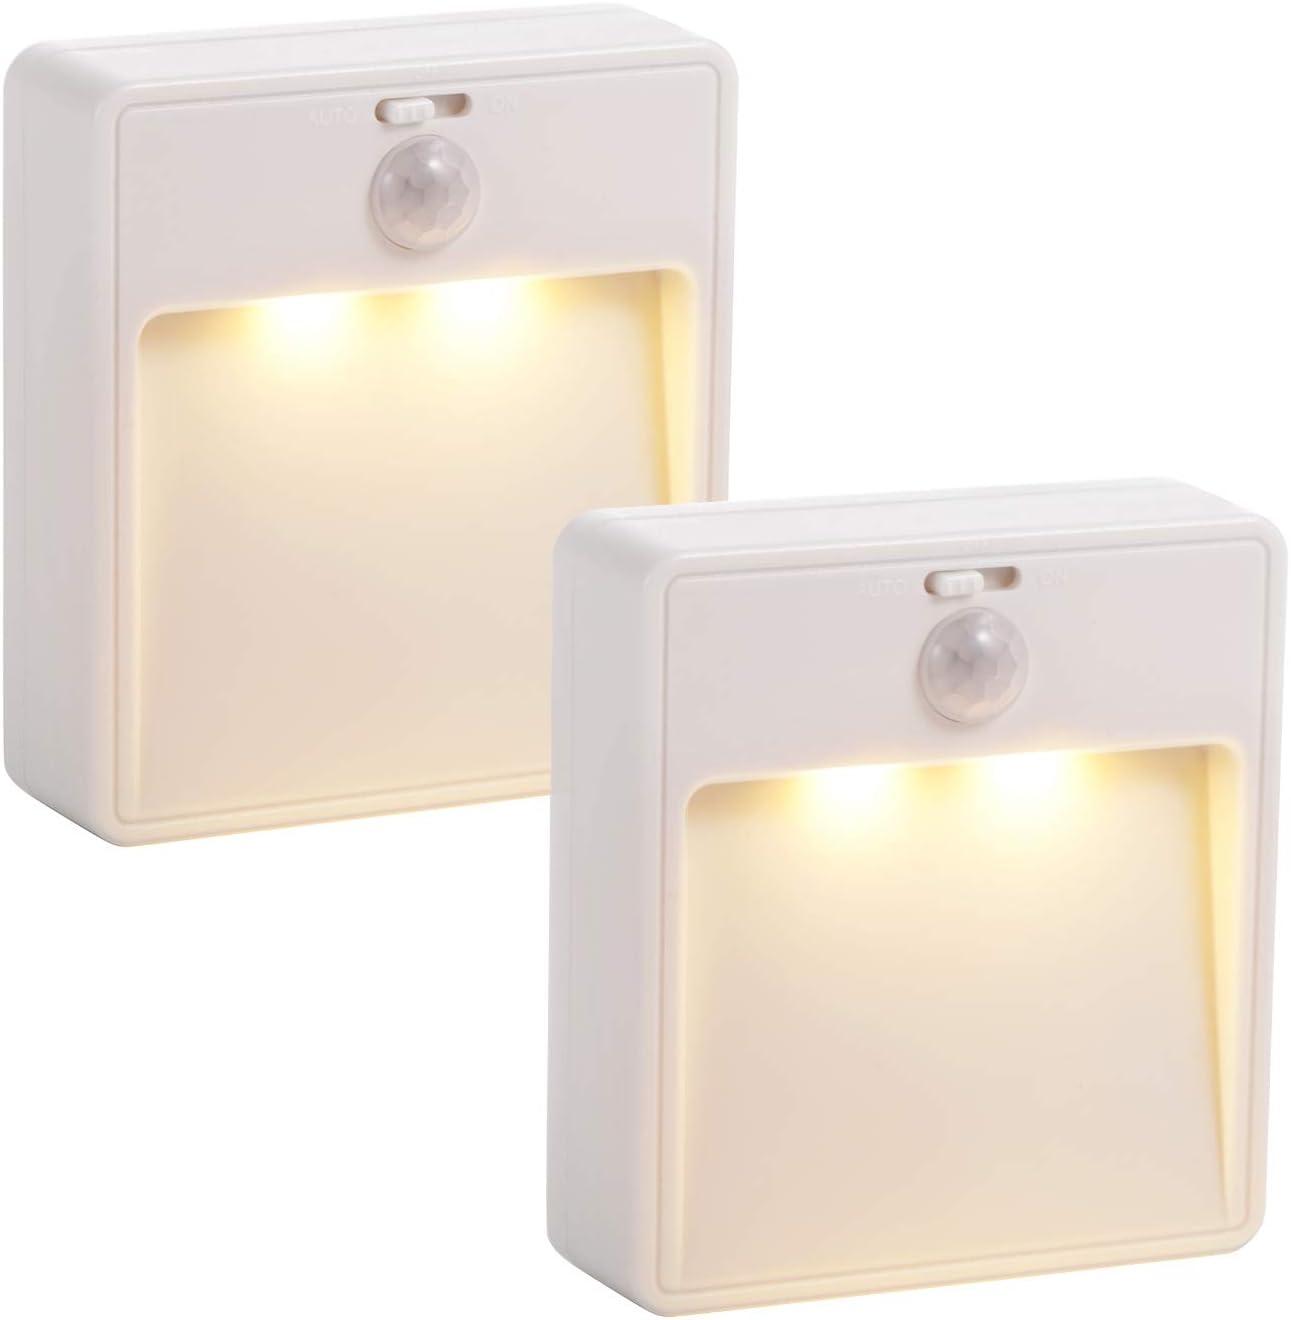 Motion Sensor Night Light, Led Bathroom Night Light Night Lights for Kids Motion Light Stick On Lights Closet Light Stair Lights Battery Operated